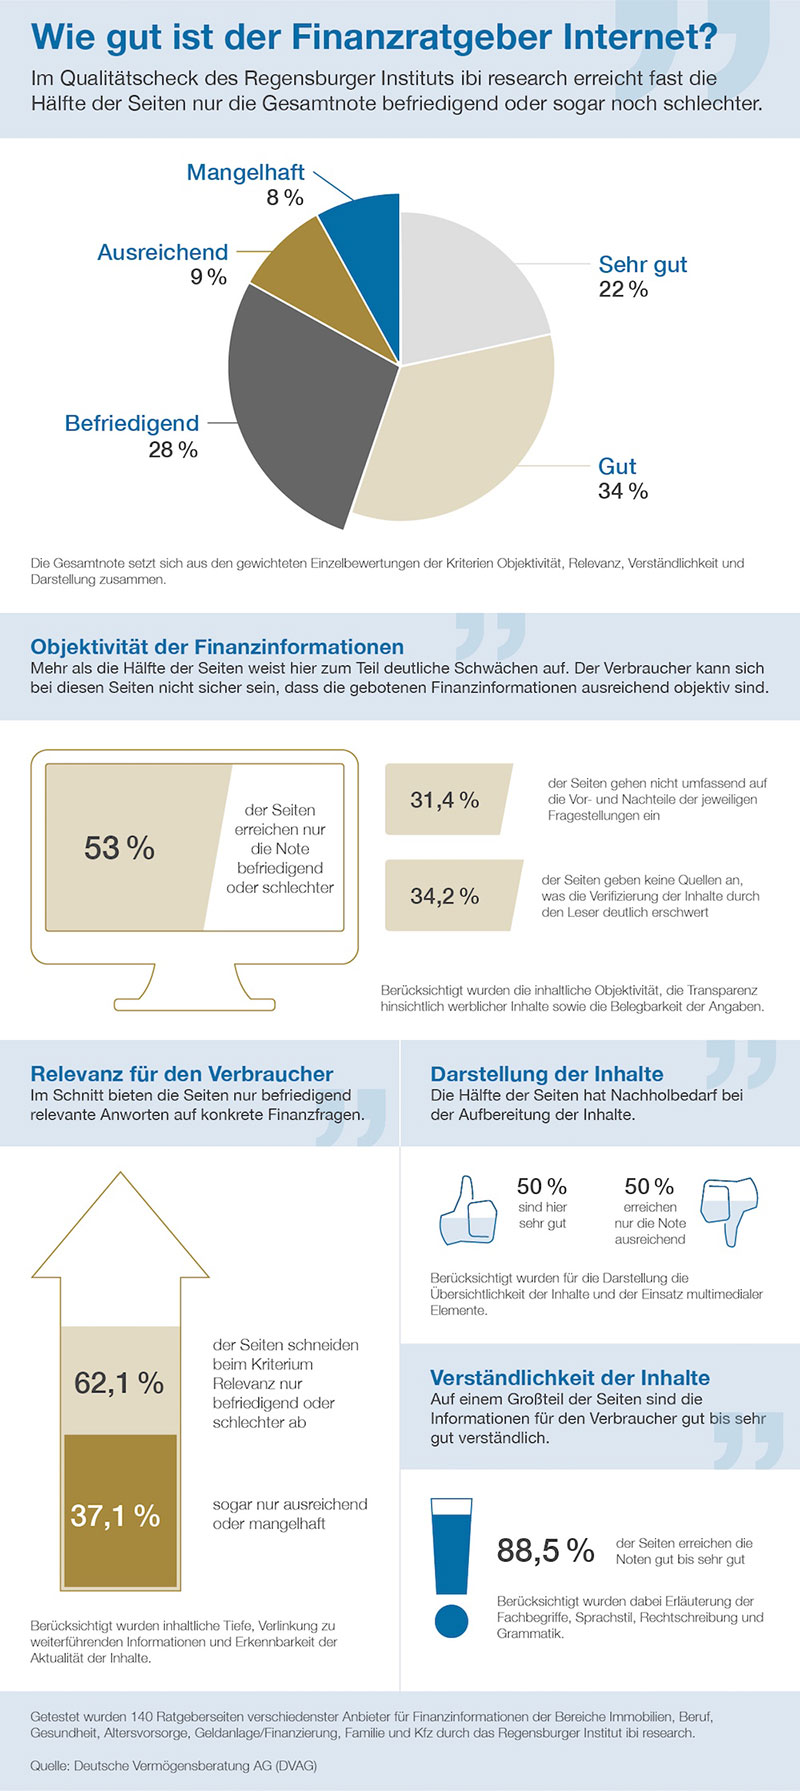 finanzratgeber-internet-grafik-2016-dvag